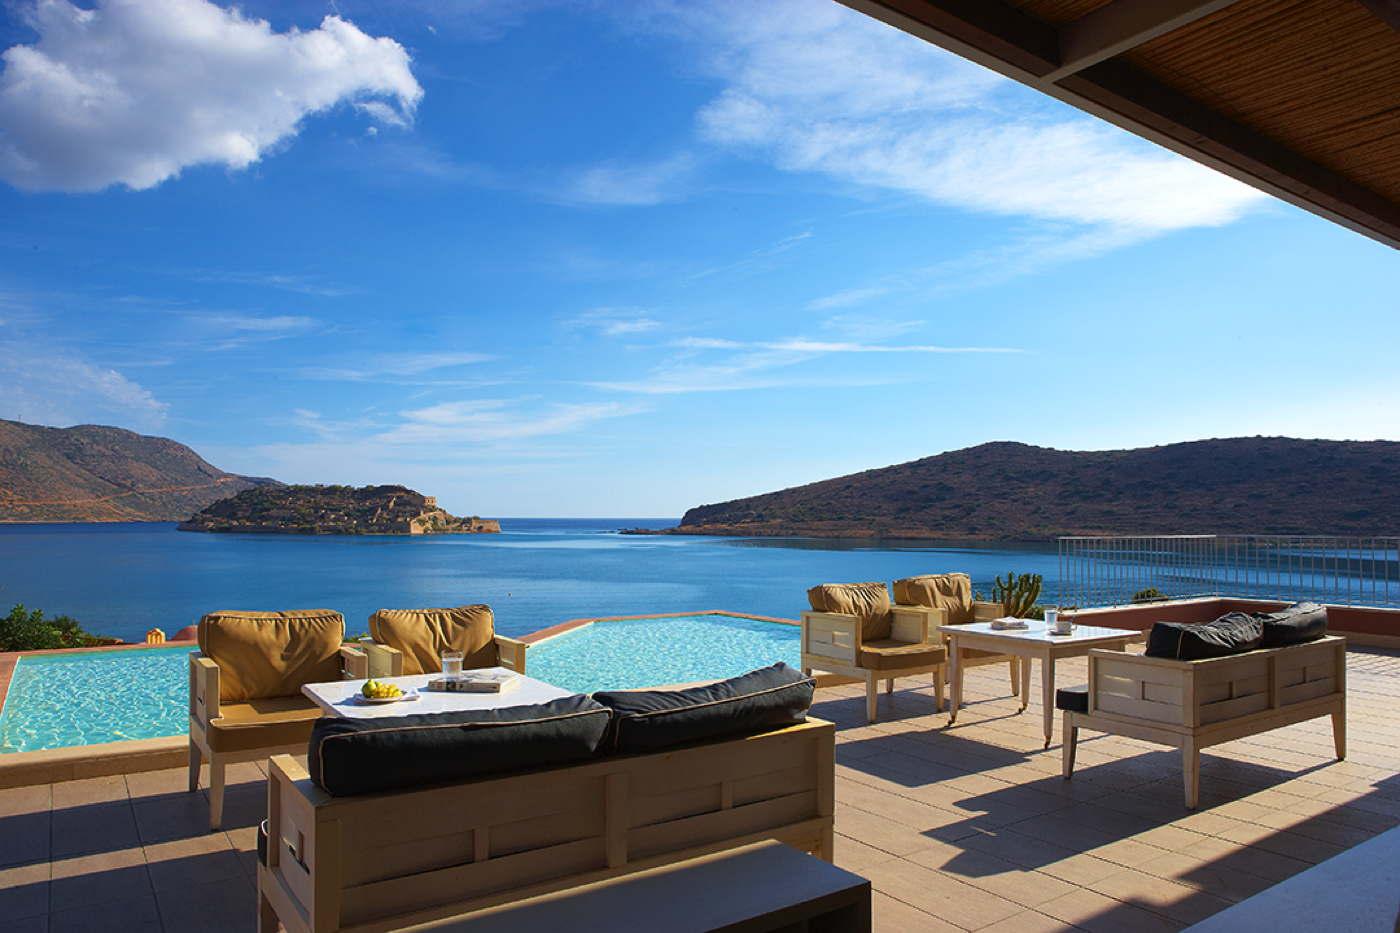 suite mit privatem pool whirlpool in elounda auf kreta. Black Bedroom Furniture Sets. Home Design Ideas